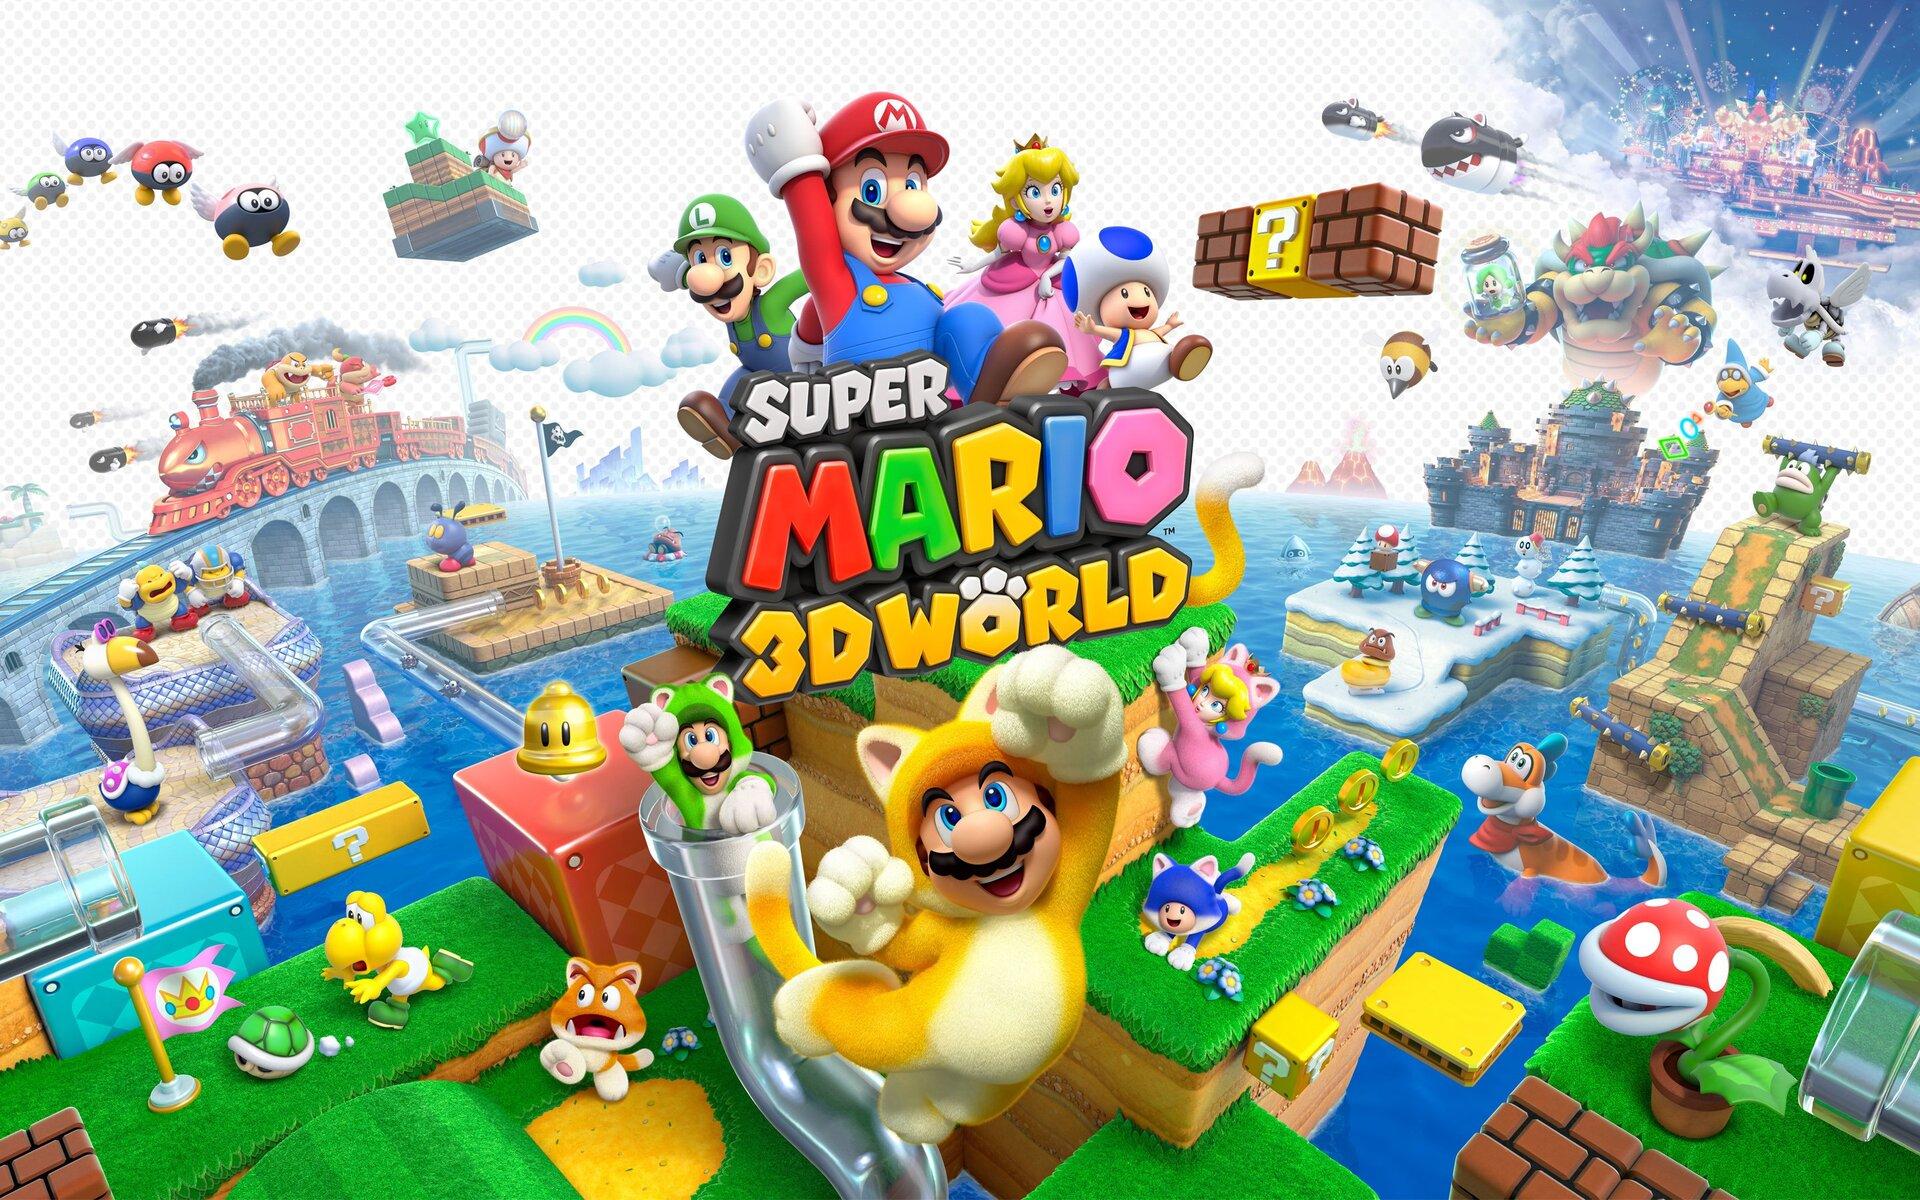 super-mario-3d-world.jpg